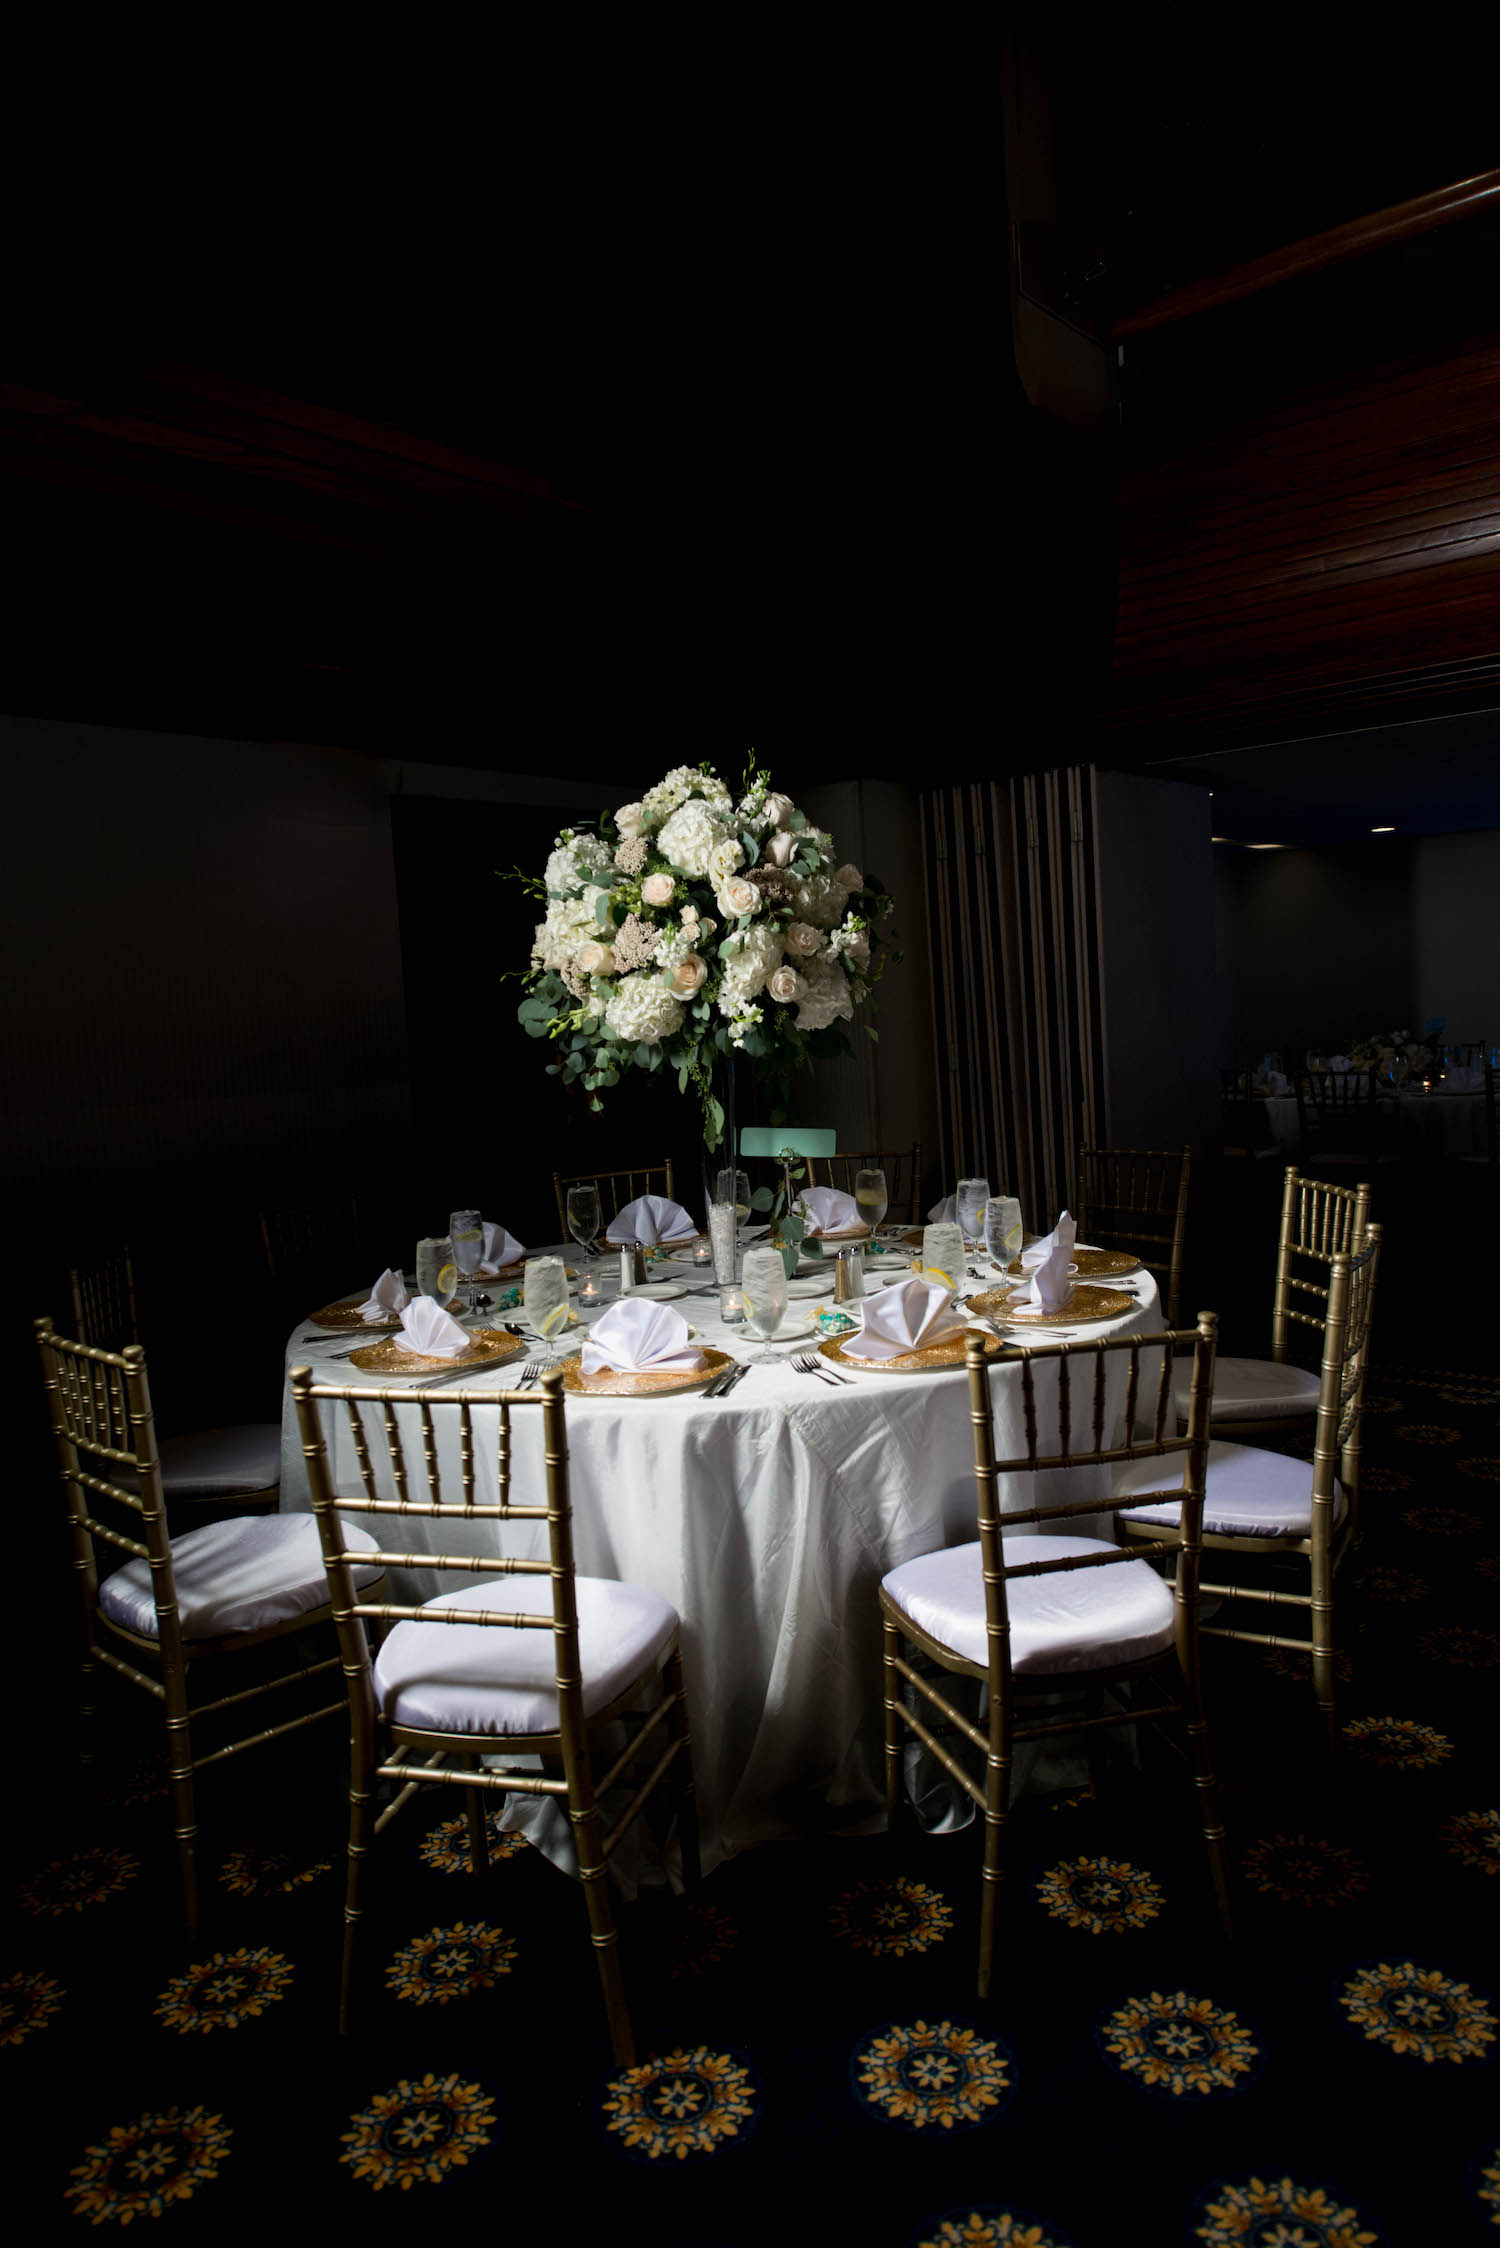 Washington DC Wedding - Sincerely Pete Events - Erin Tetterton Photography - National Press Club Wedding